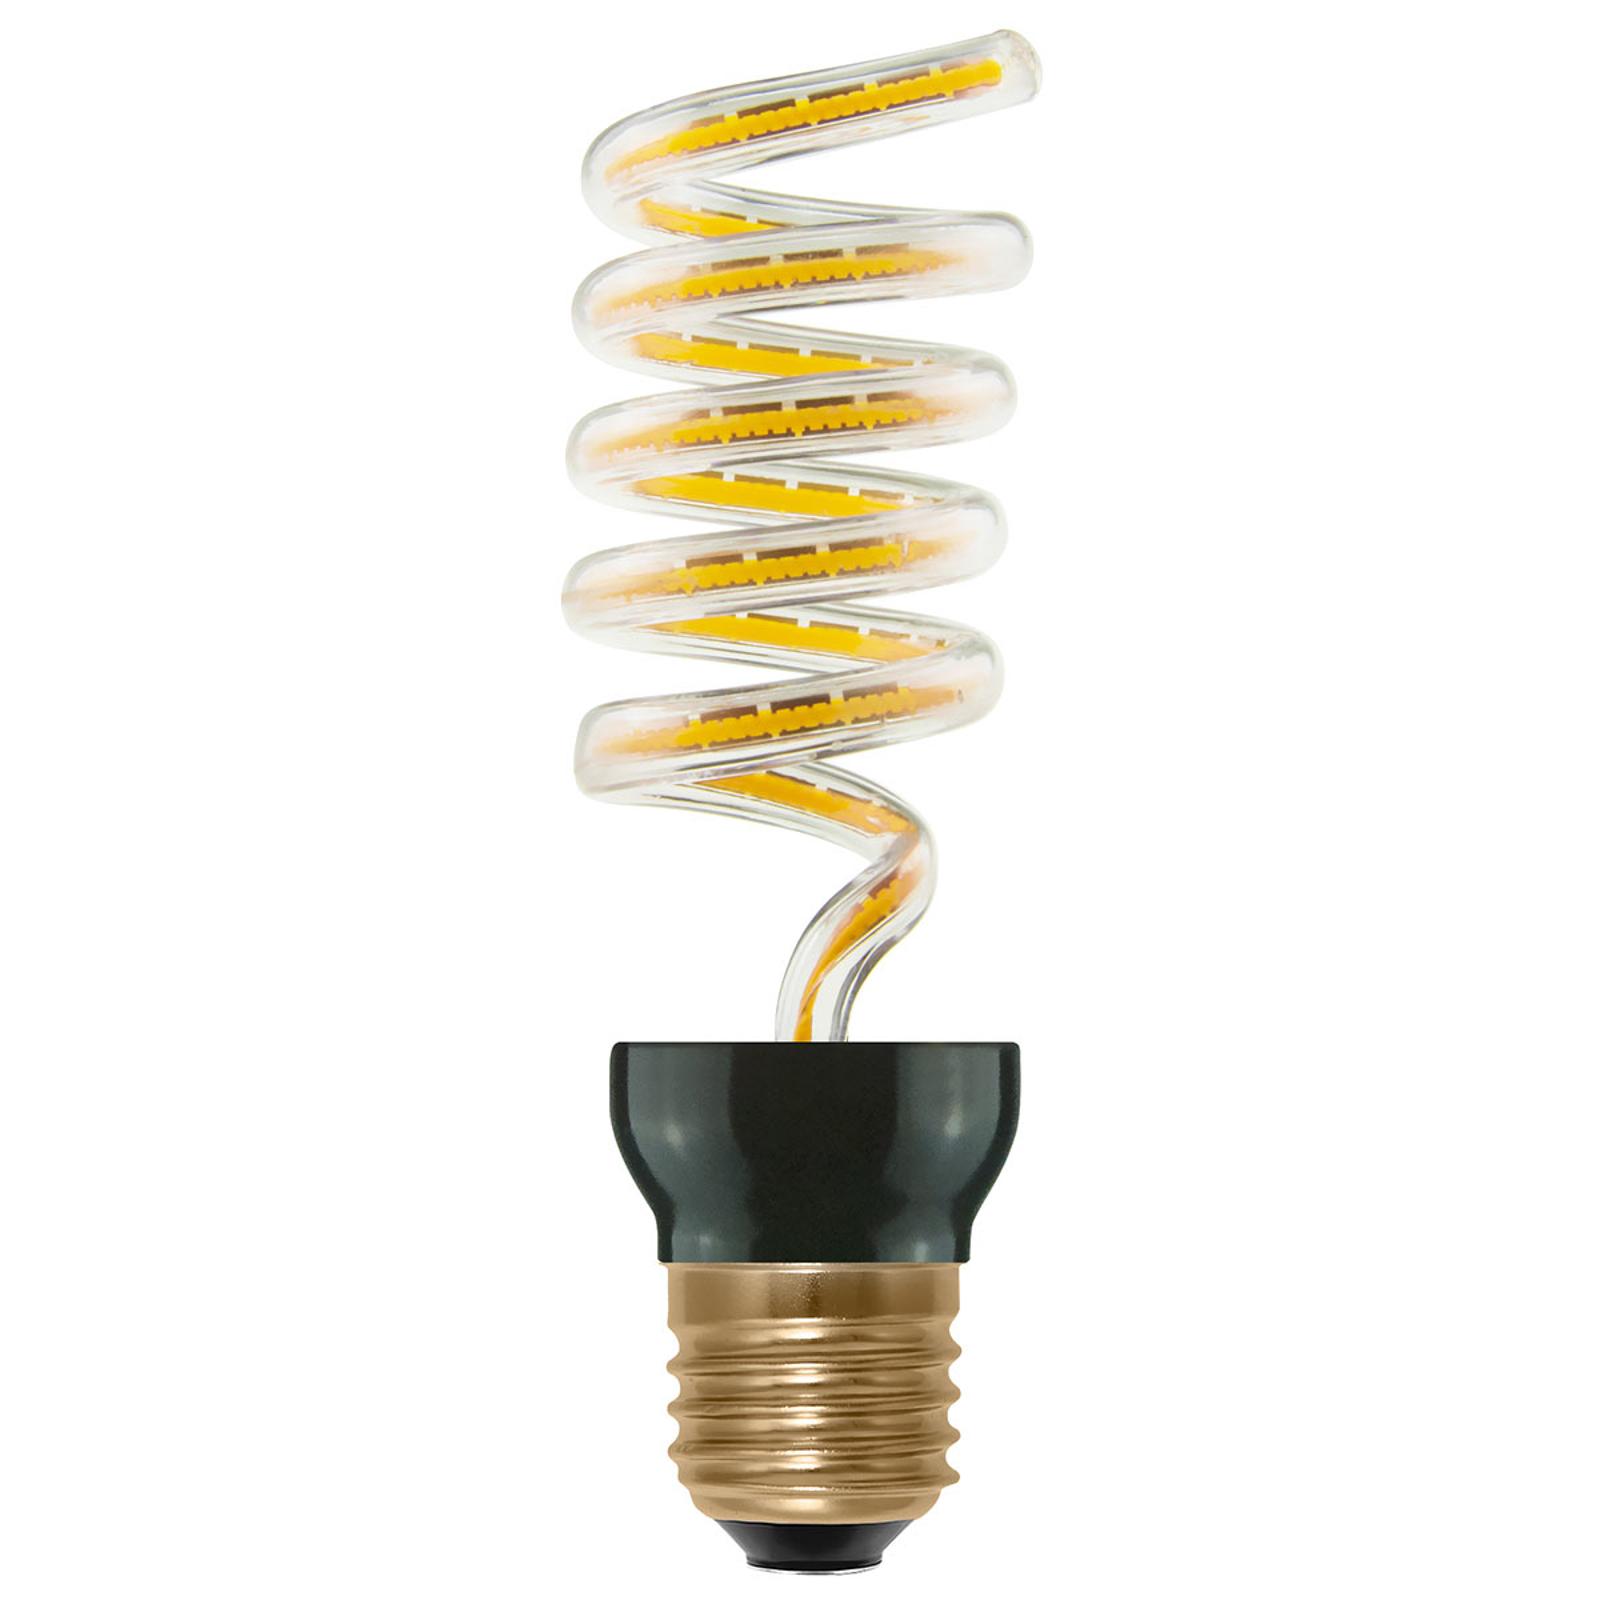 LED-Lampe Art Line Loop up E27 12W 500 lm warmweiß